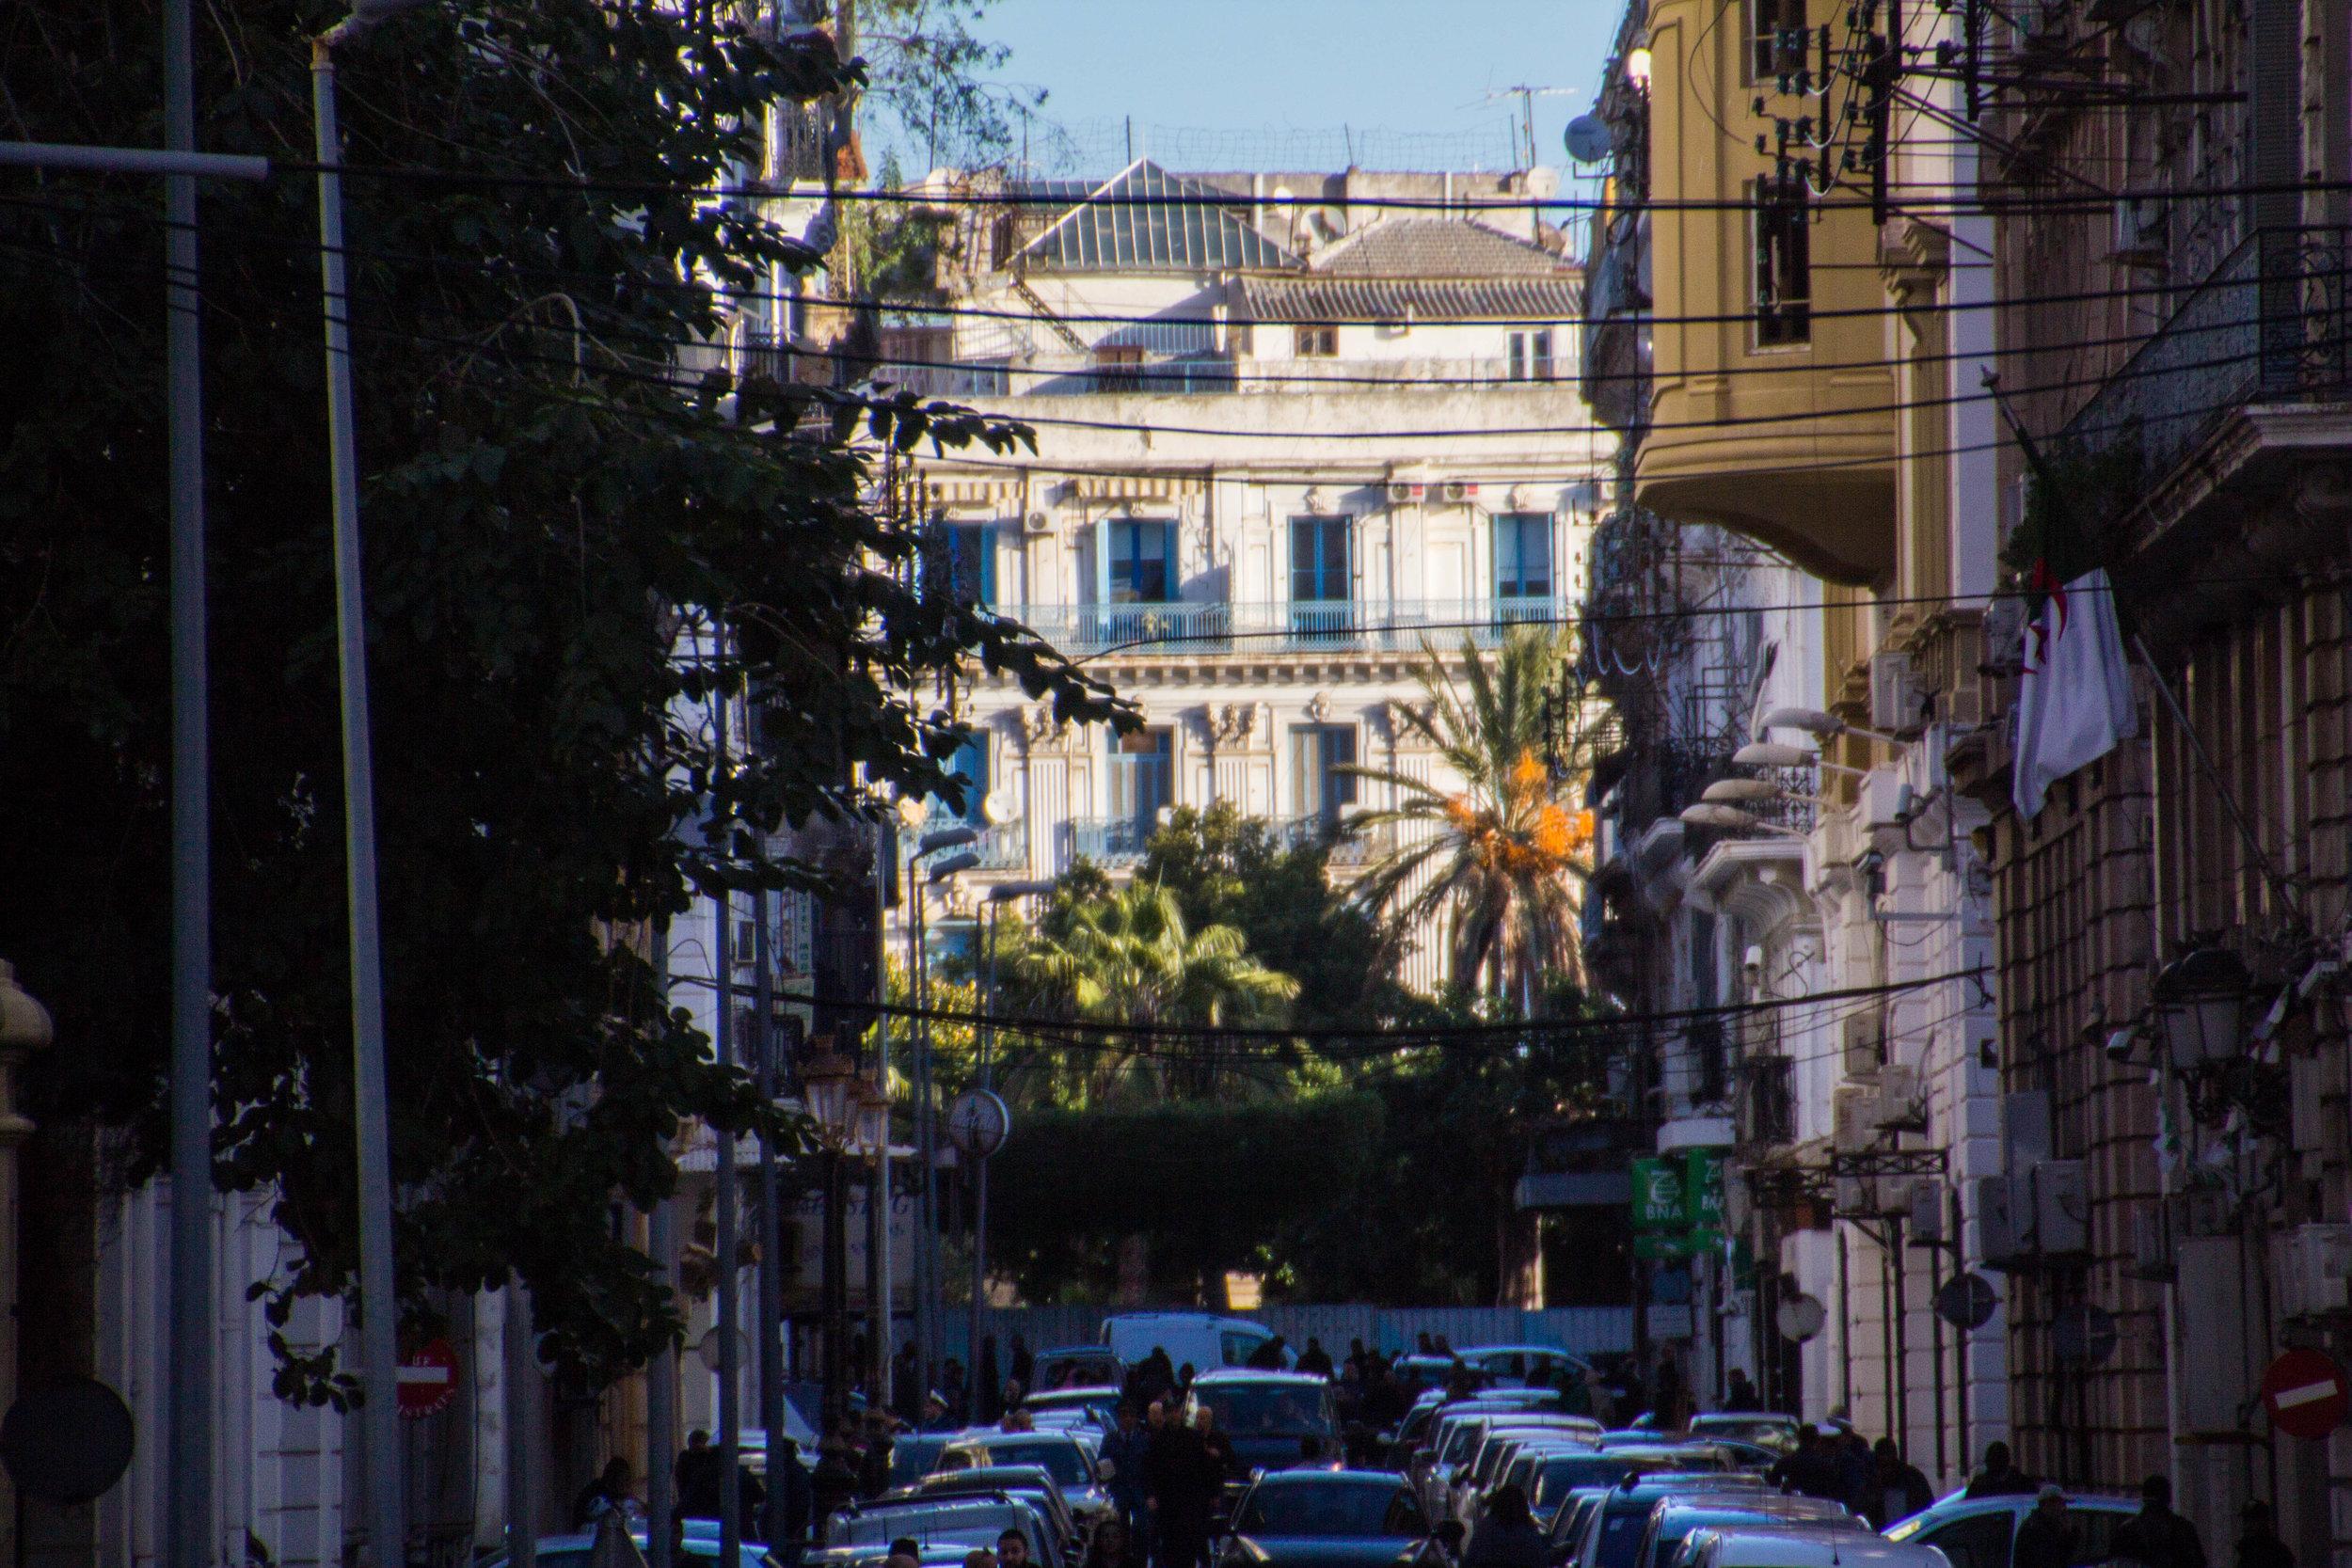 street-photography-algiers-algeria-23.jpg